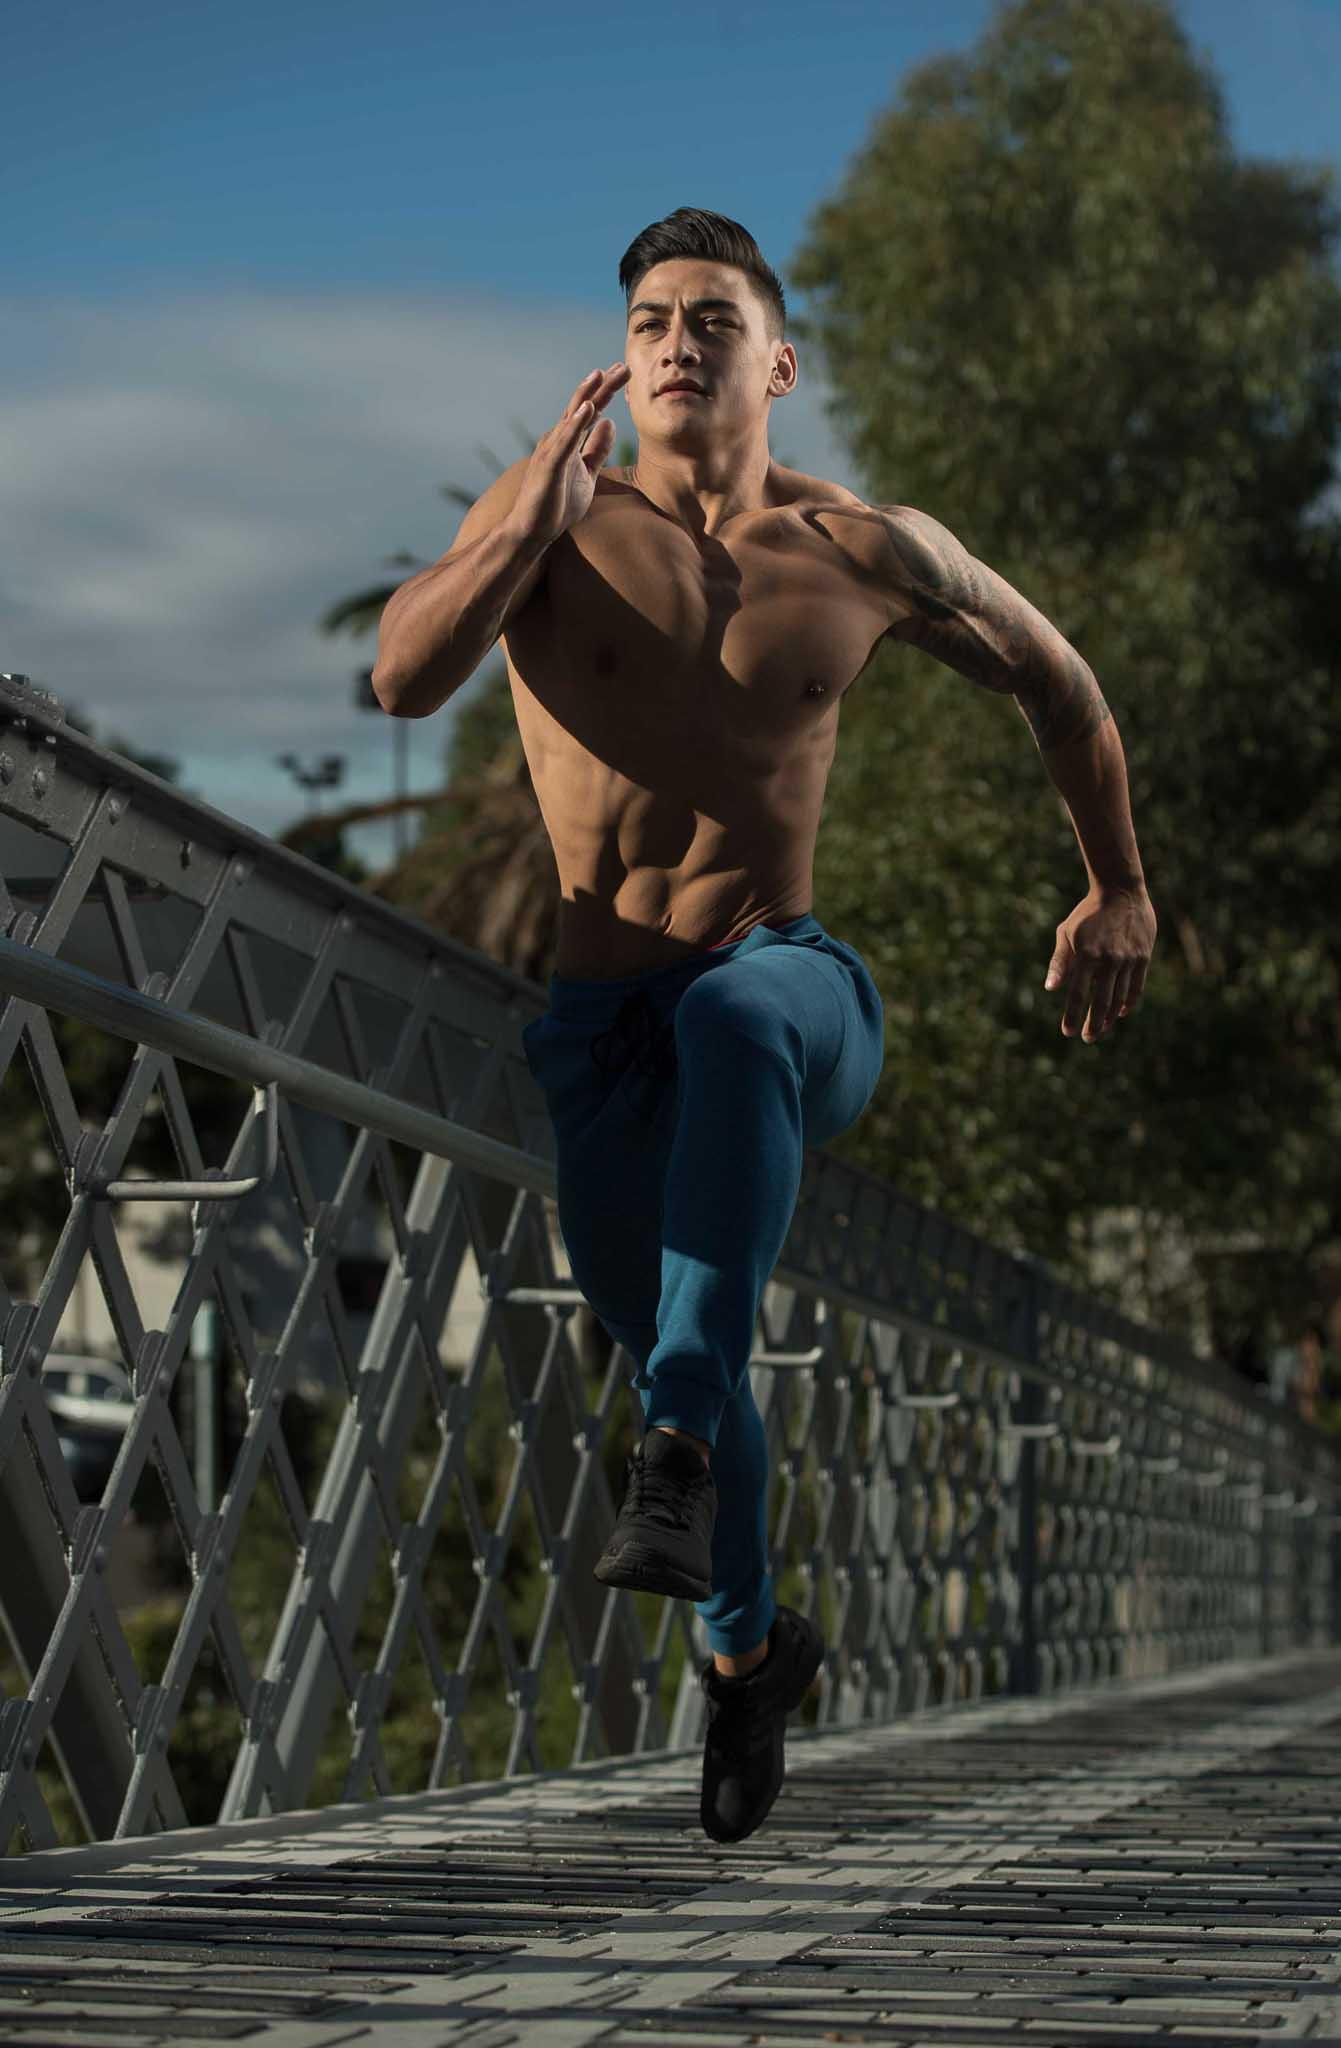 James sprinting Over a bridge walkway